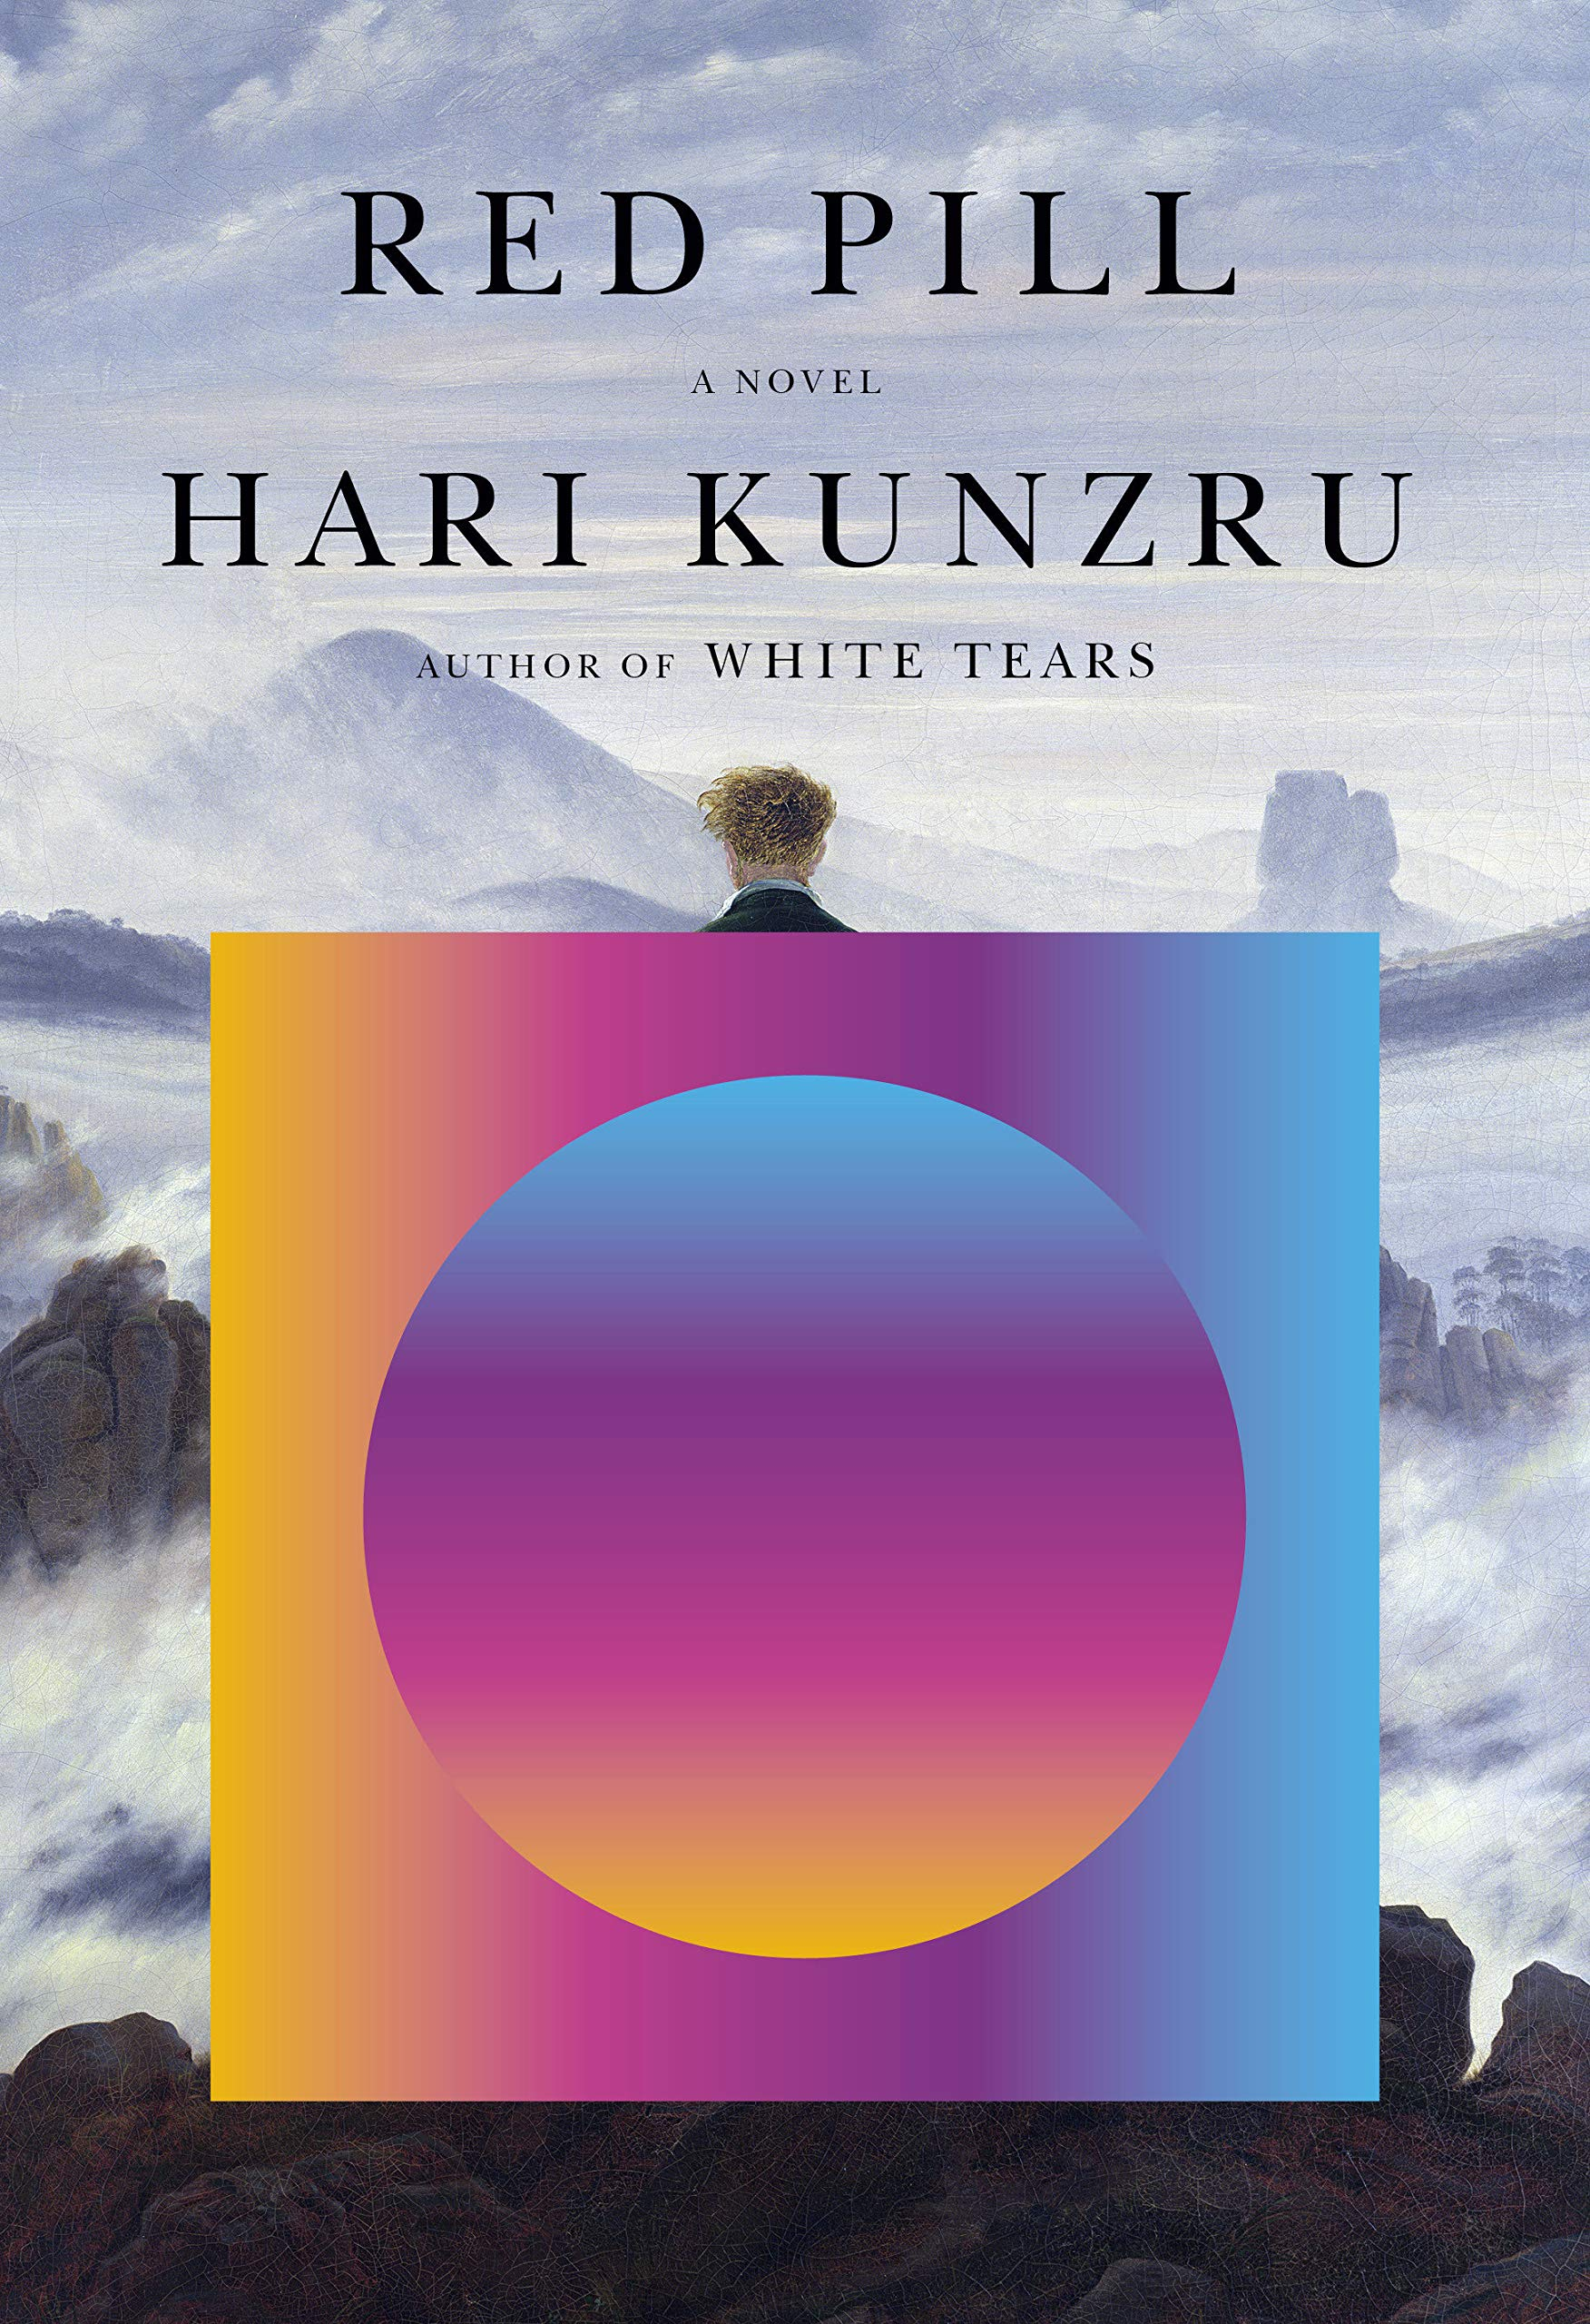 Red Pill: A novel: Kunzru, Hari: 9780451493712: Amazon.com: Books